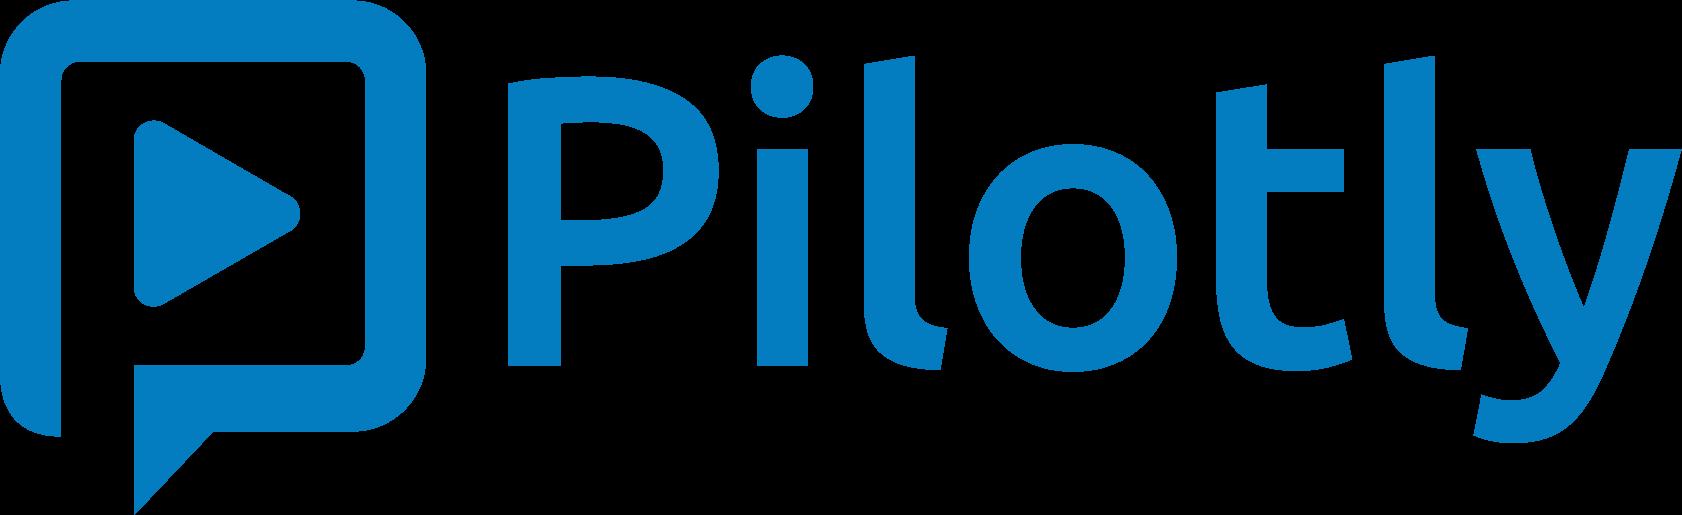 pilotly_logo_cerulean